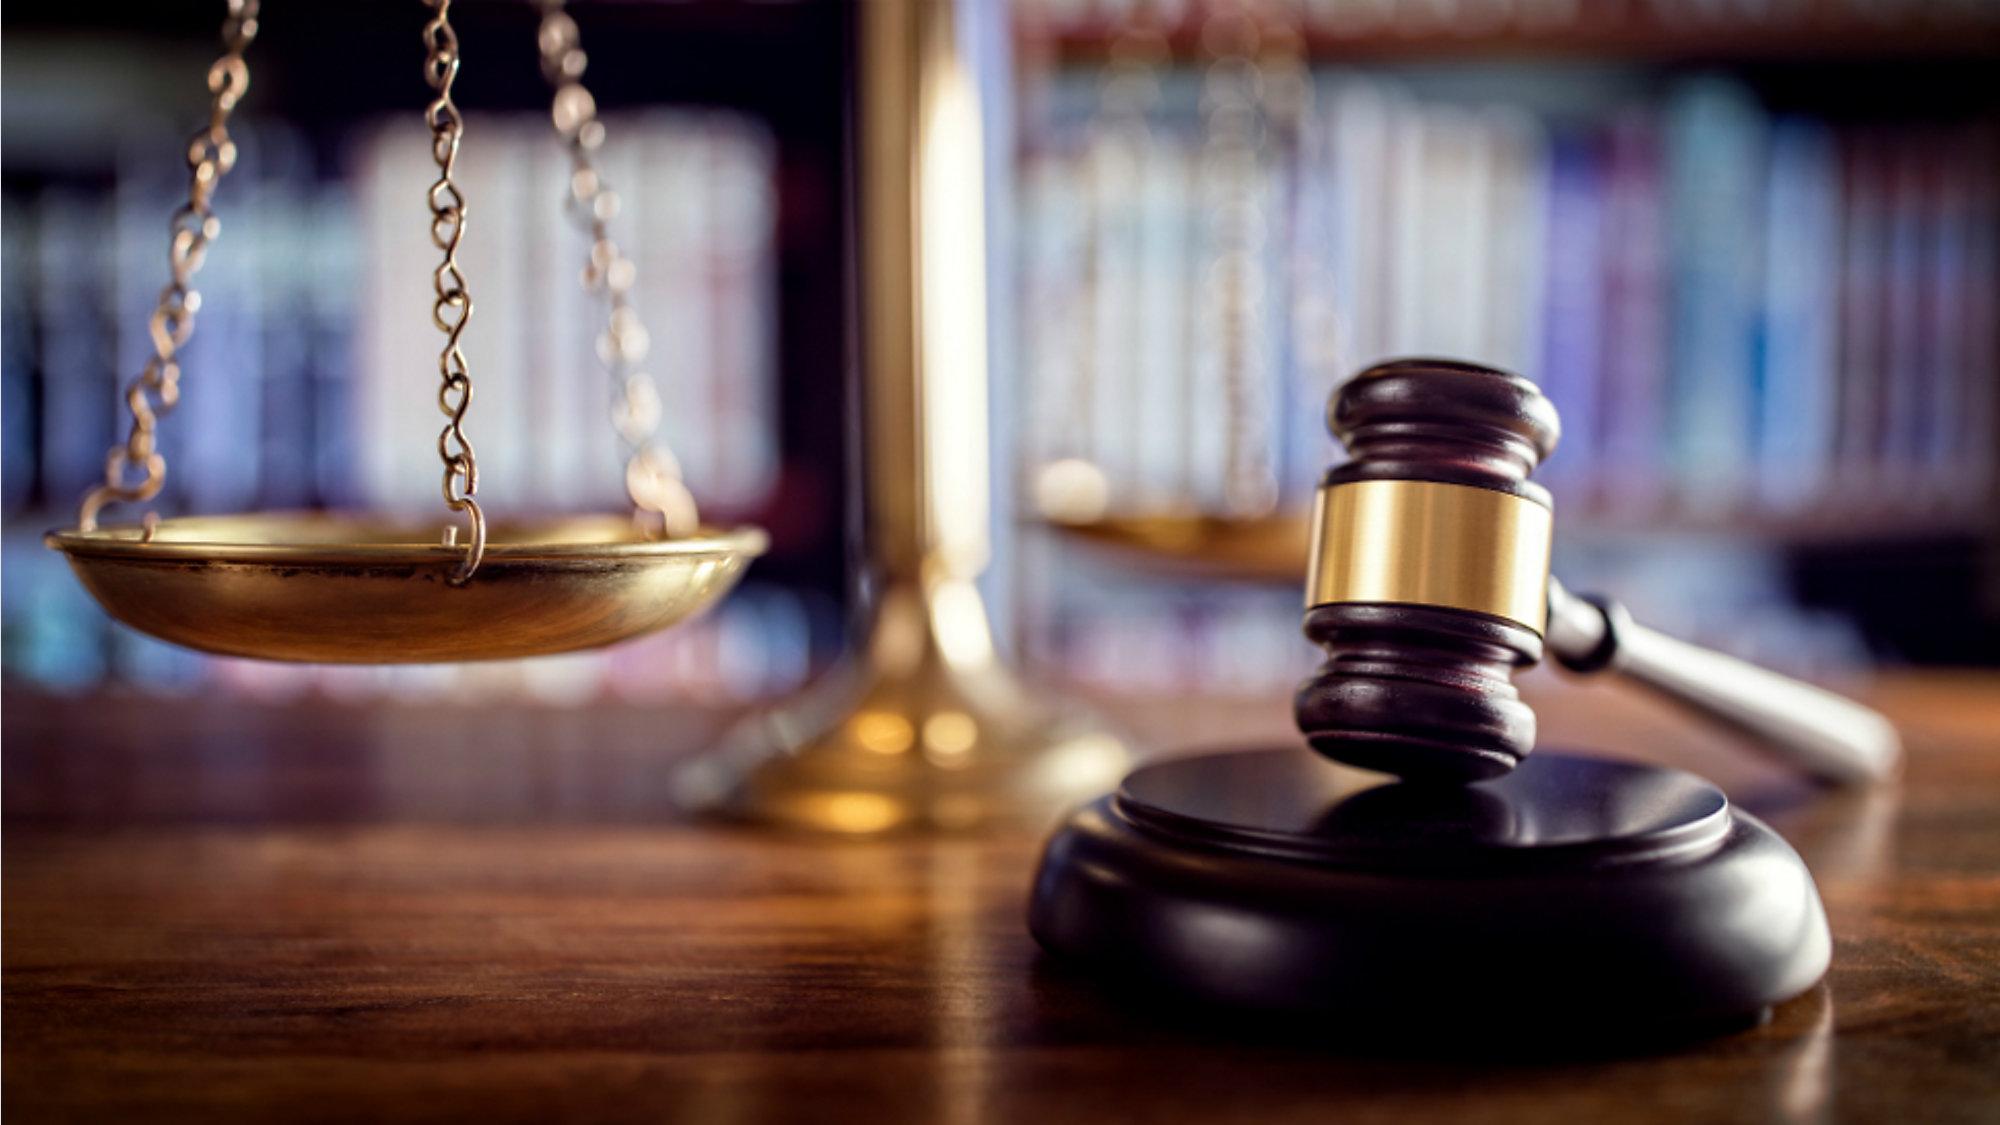 Seminole Attorney Drops Judicial Bid After Teen Sex Charges